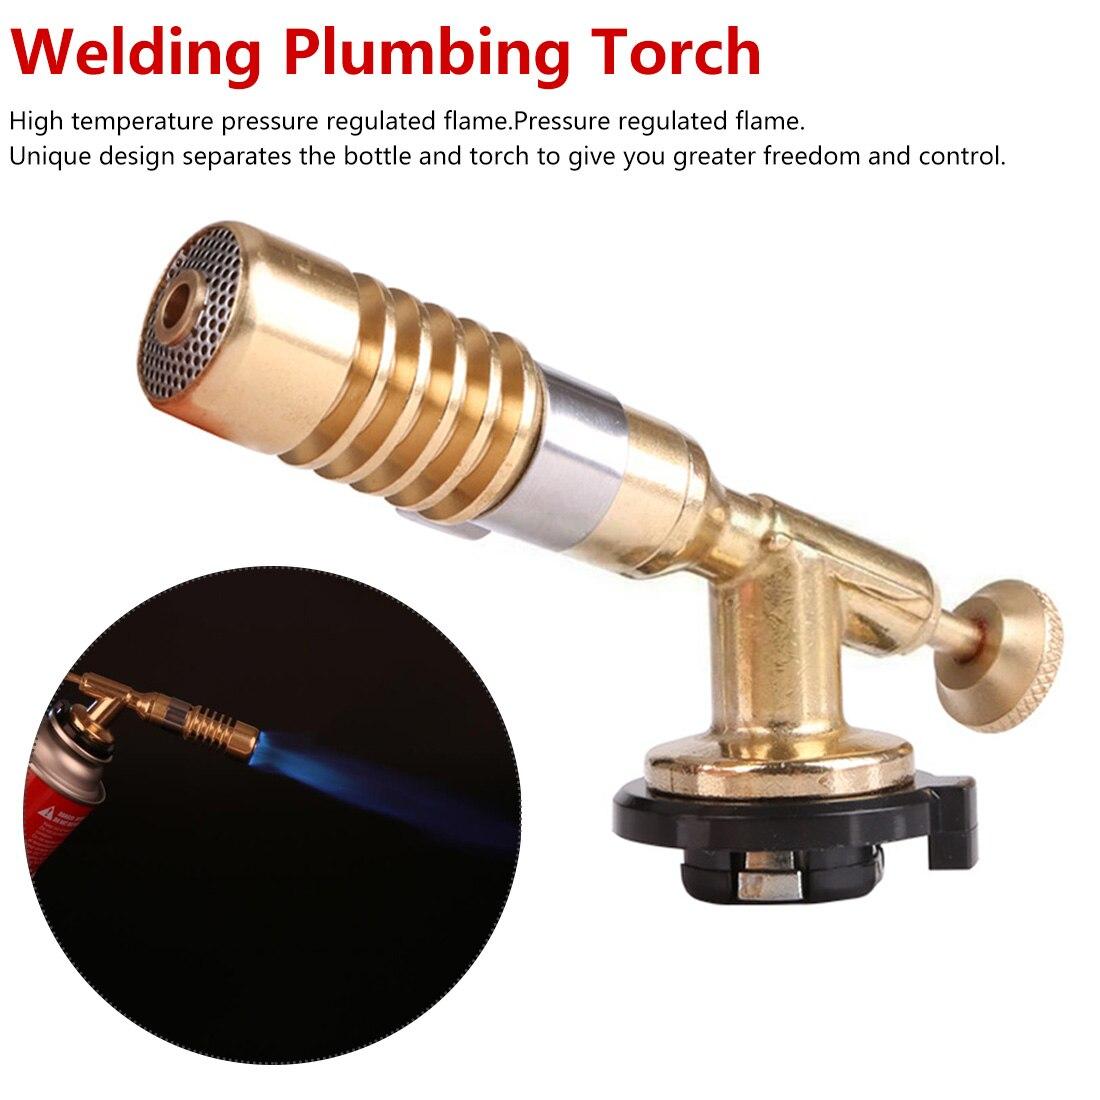 1300 C Flame Adjustable Temperature Brass Gas Turbo Torch Aluminum Brazing Propane Weld Plumbing